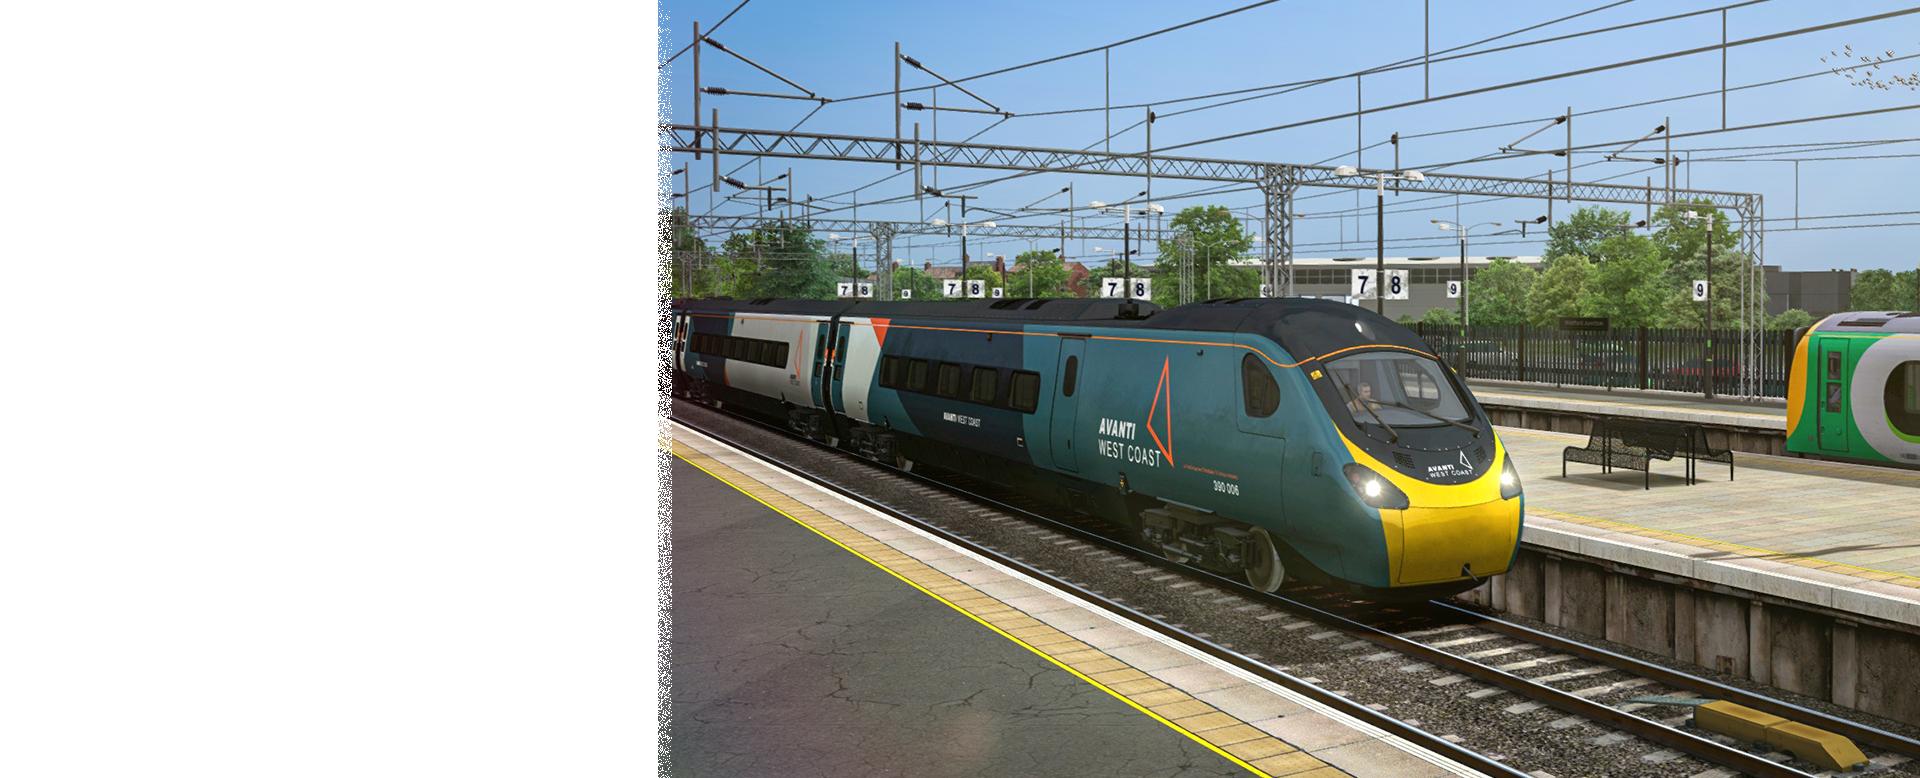 WCML South: London Euston - Birmingham